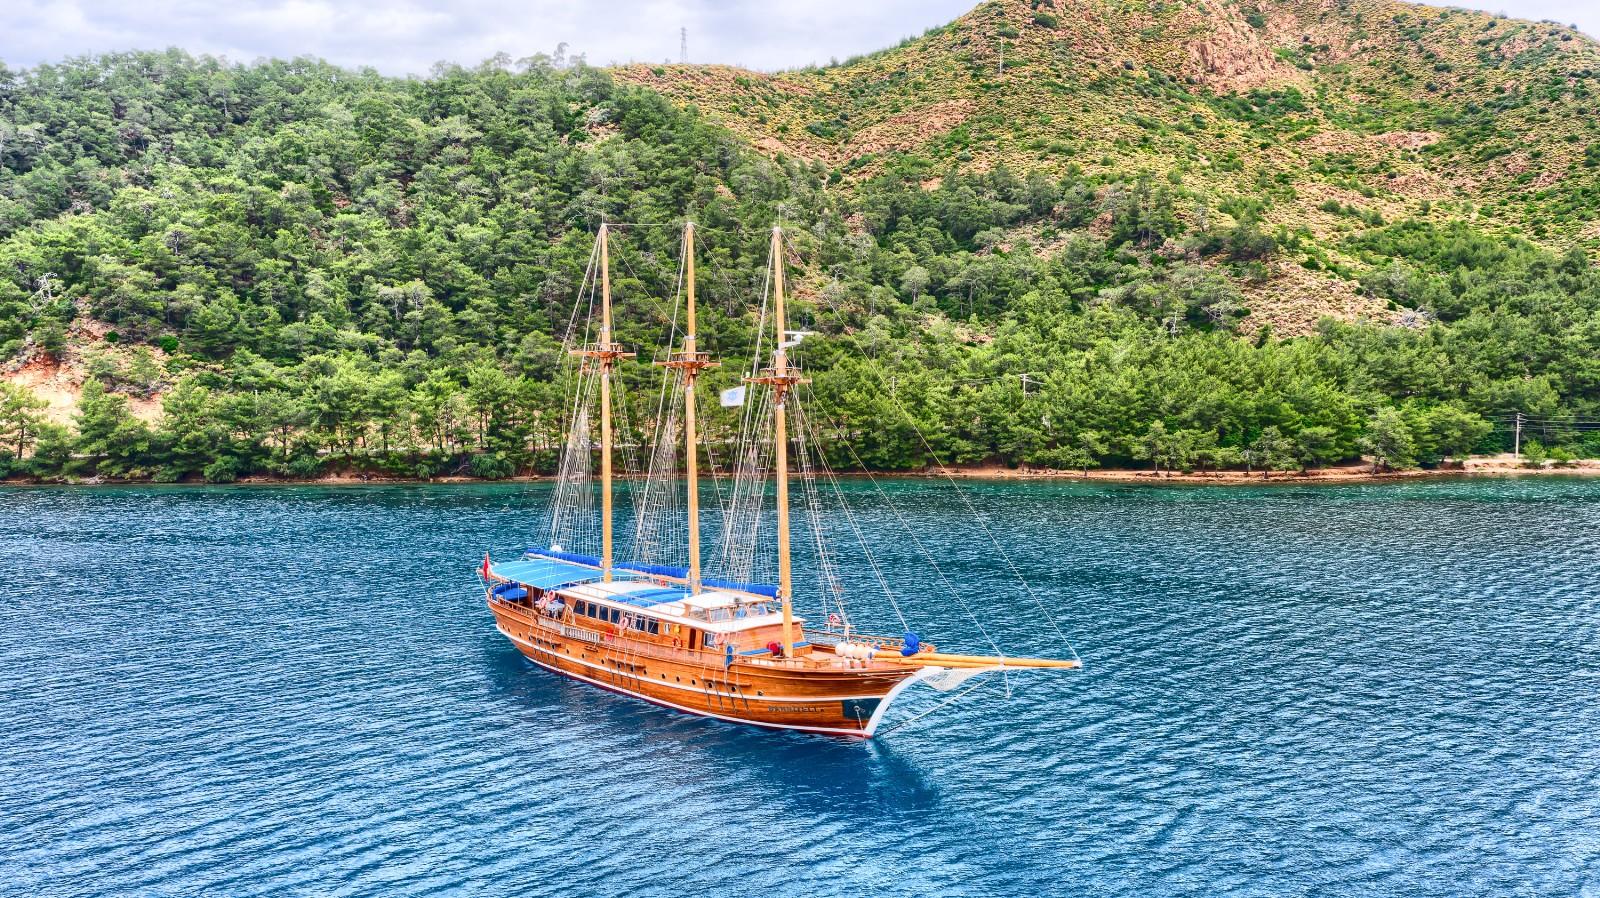 Bahriyeli (B and C) - Barge/Boat for Bike Tours